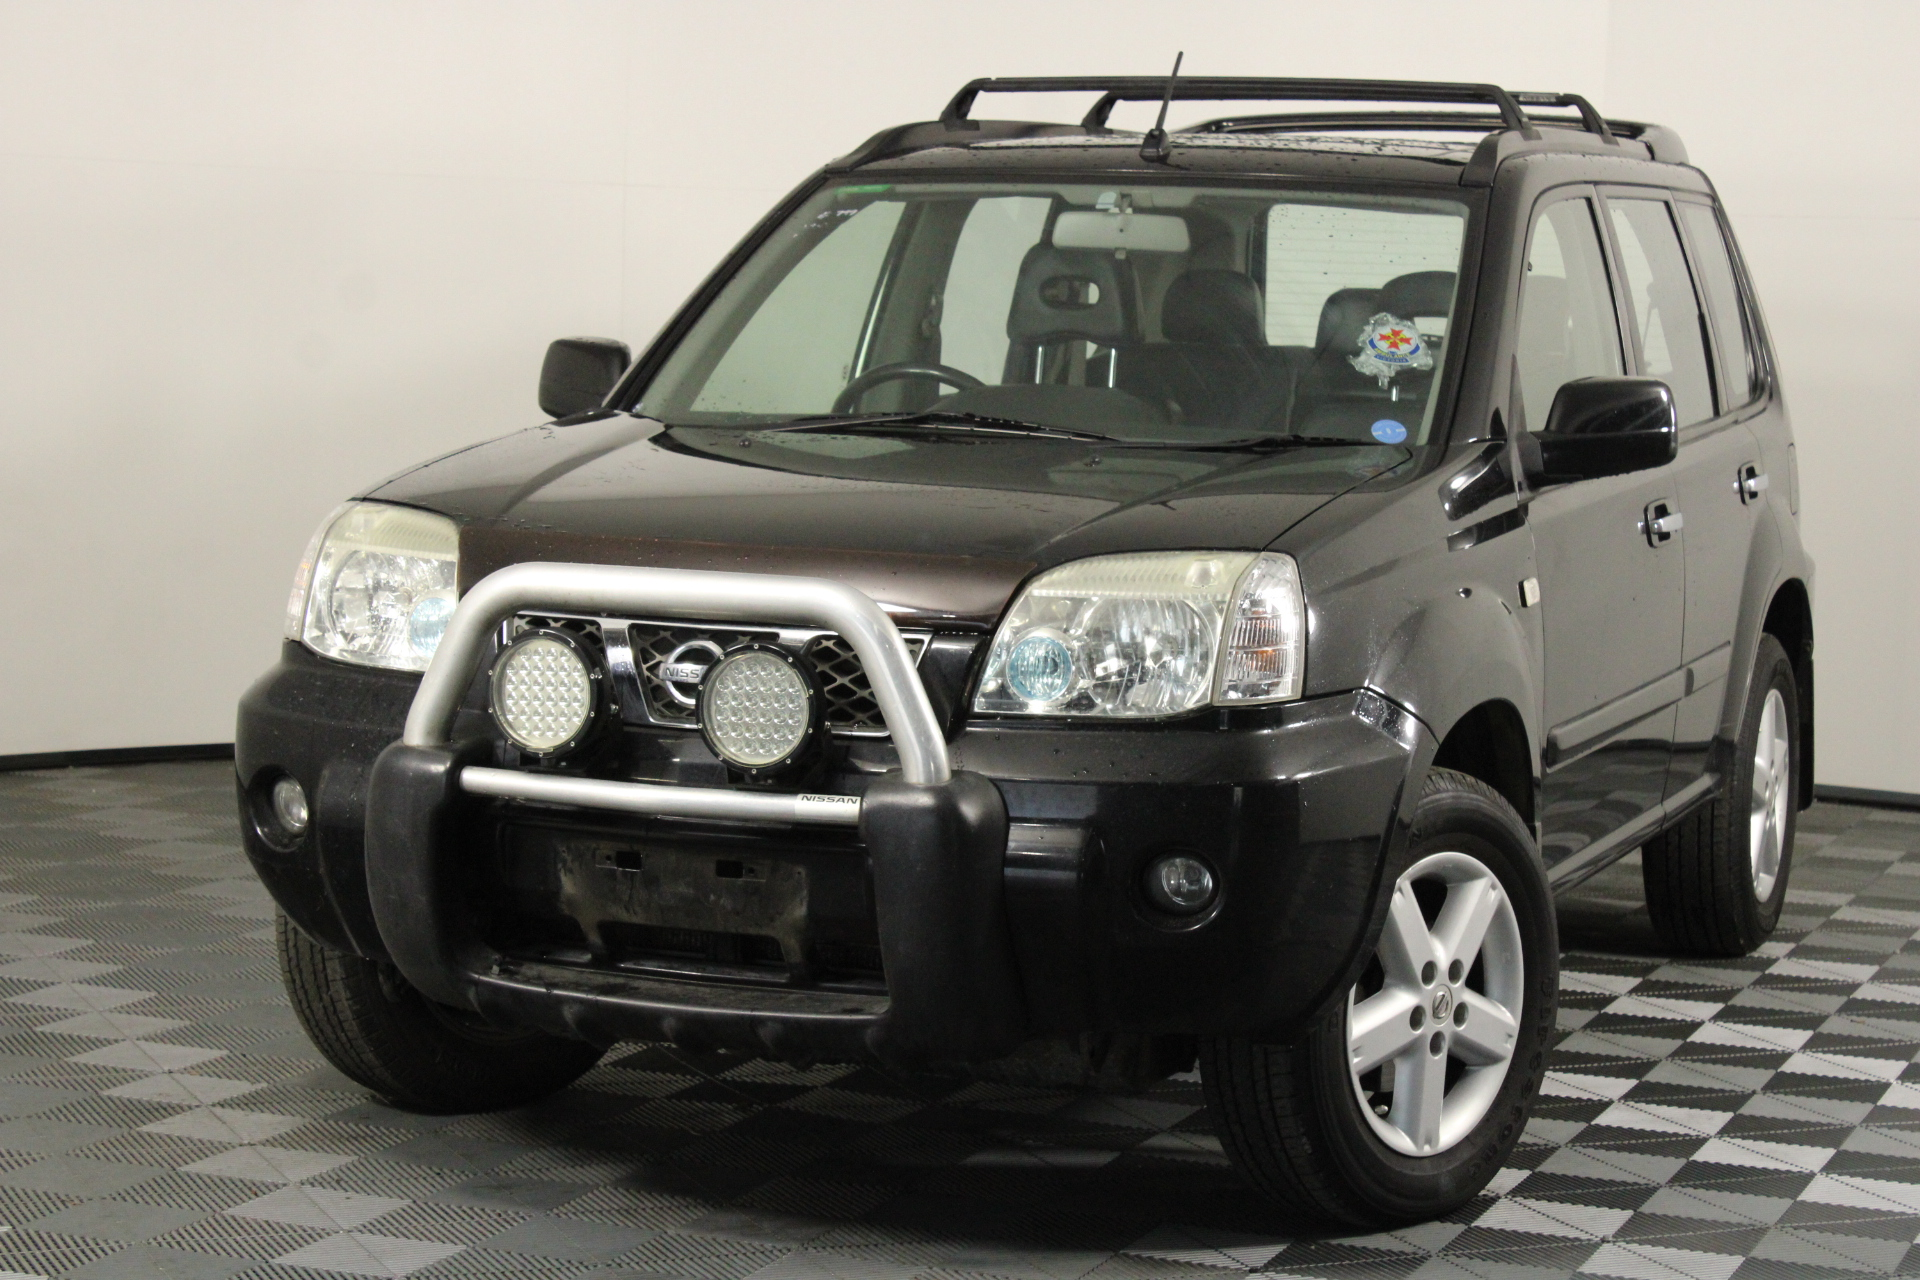 2005 Nissan X-Trail TI Luxury T30 Automatic Wagon